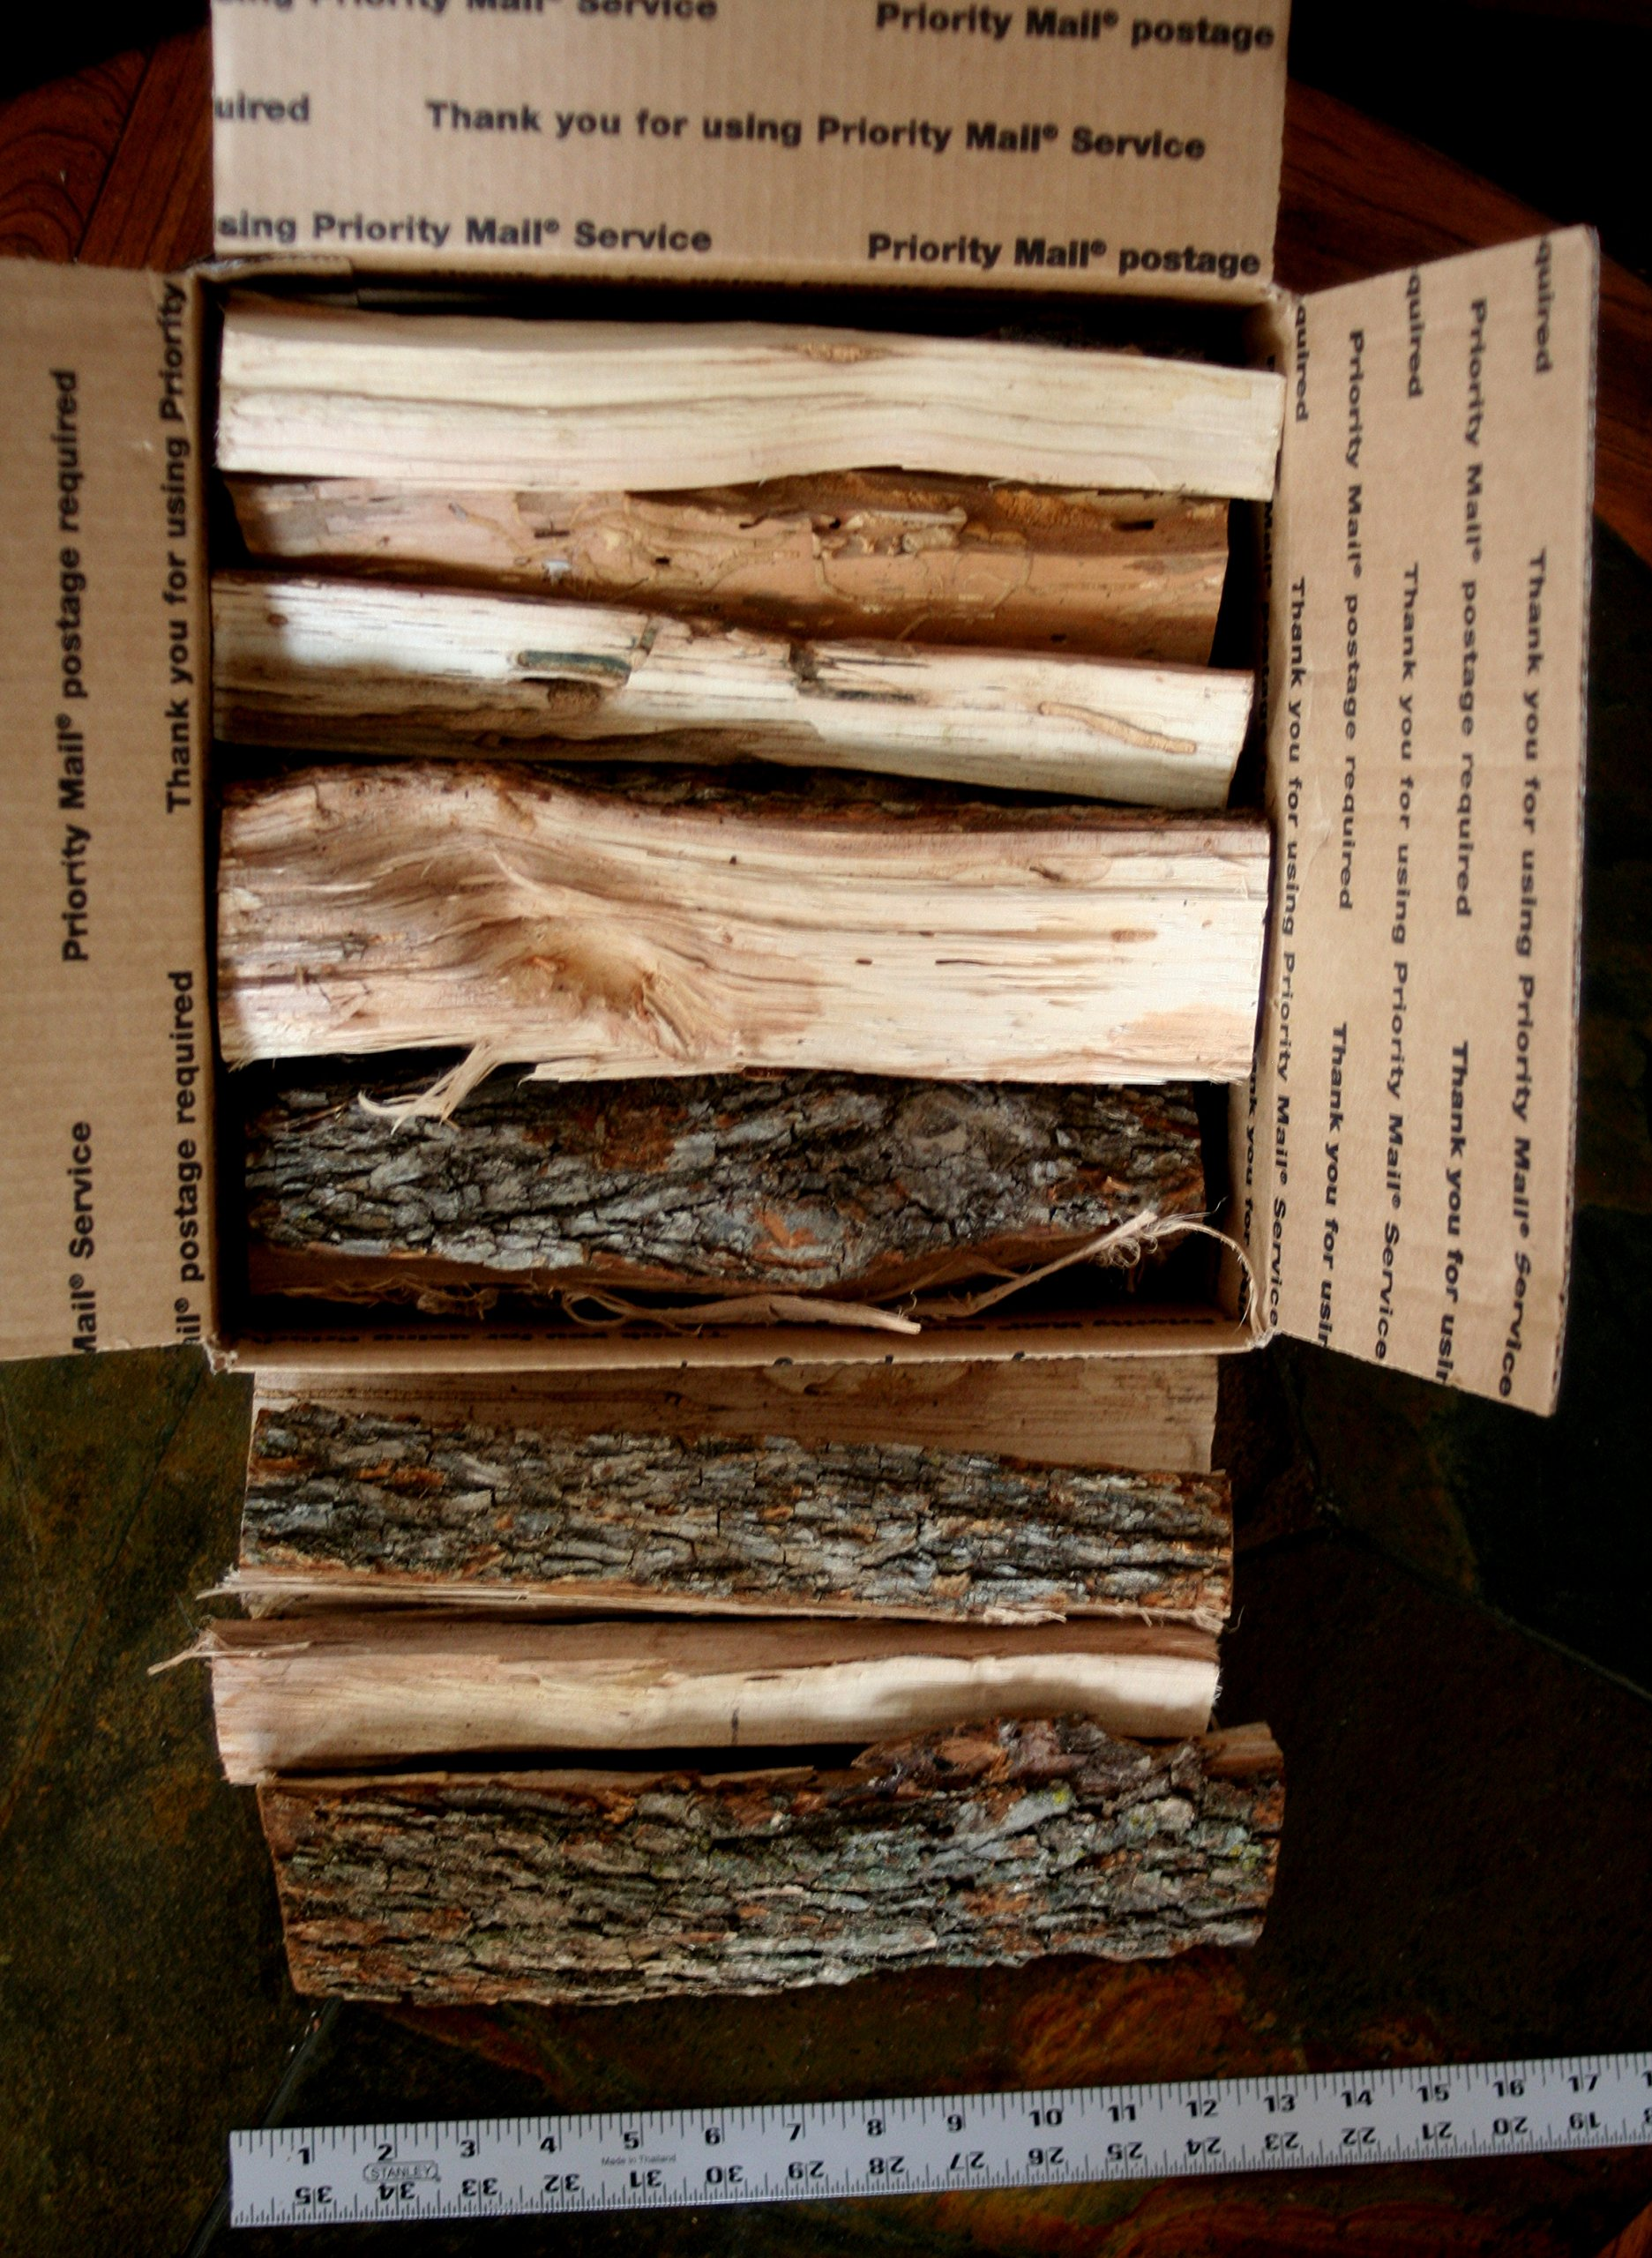 J.C.'s Smoking Wood Sticks - 18# / Approx 1200 Cu Inch Box - Apple